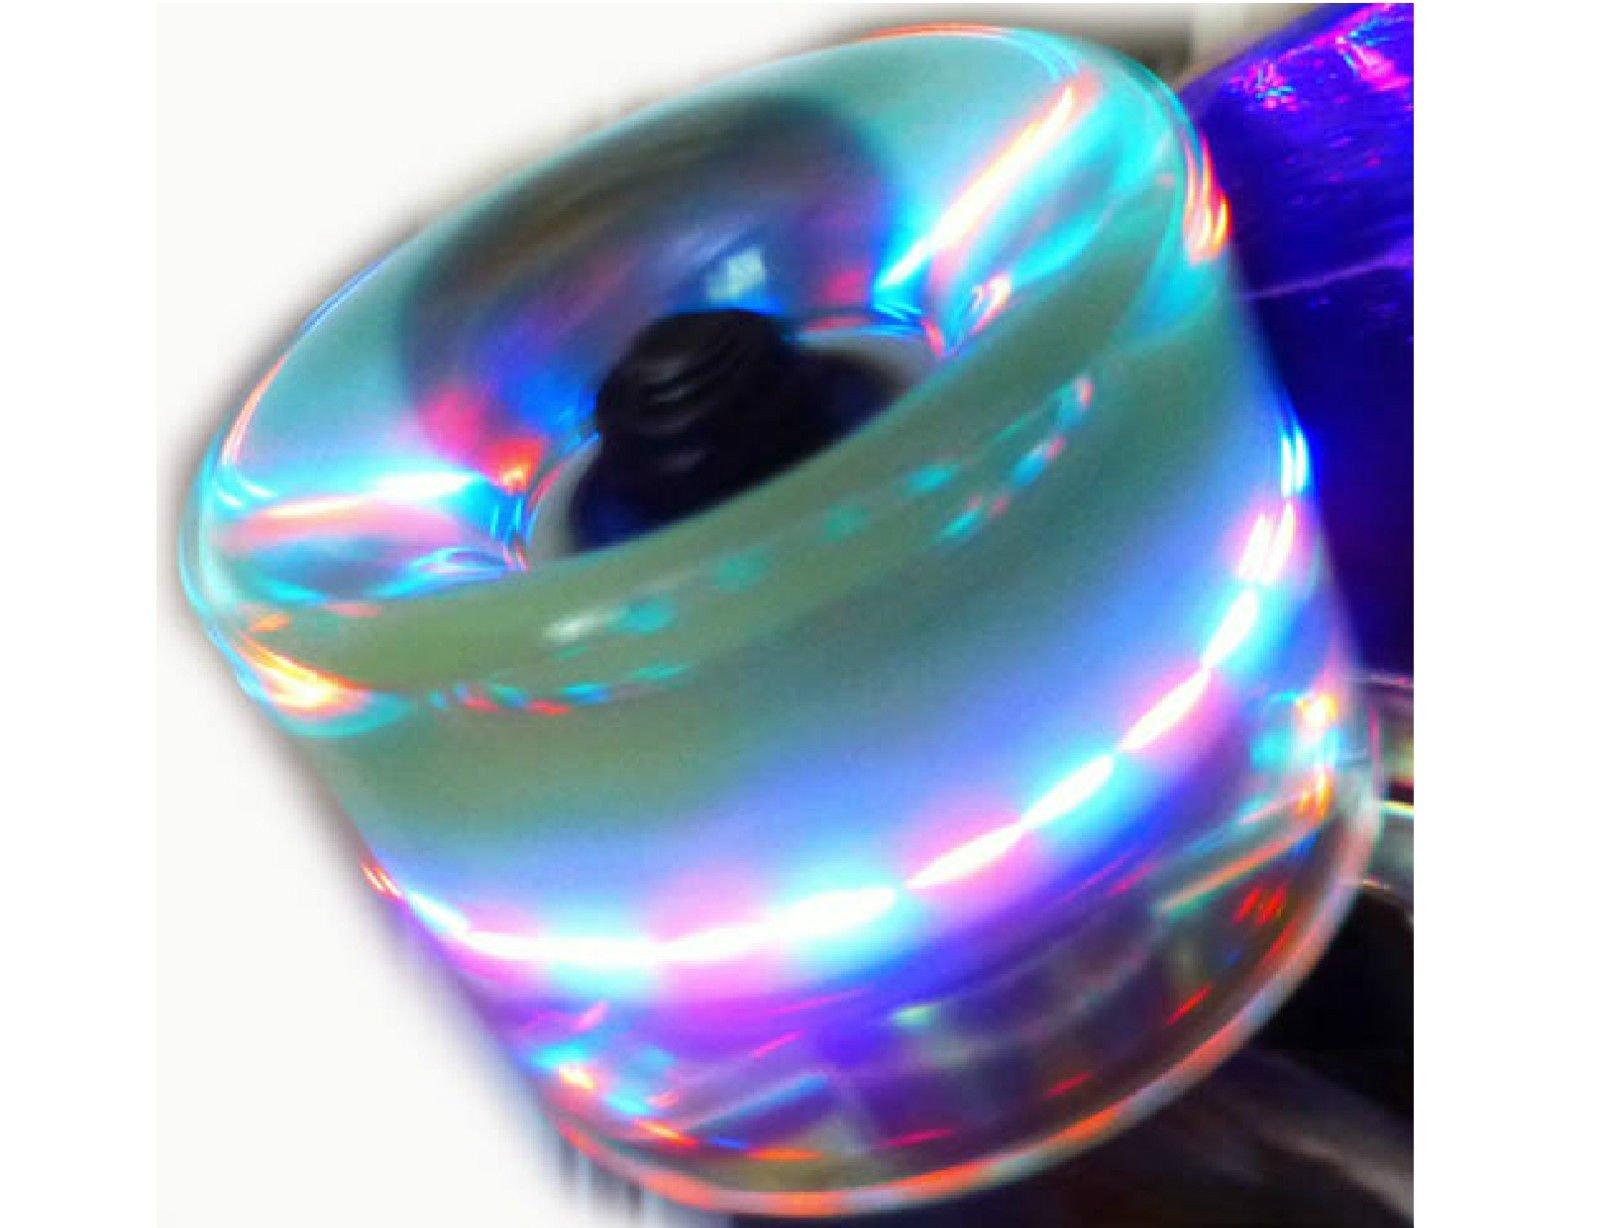 Owlsome Skateboard 22'' x 6'' Rechargeable LED Light Up Deck/Wheels Plastic Mini Cruiser (Orange) by Owlsome Skateboard (Image #3)